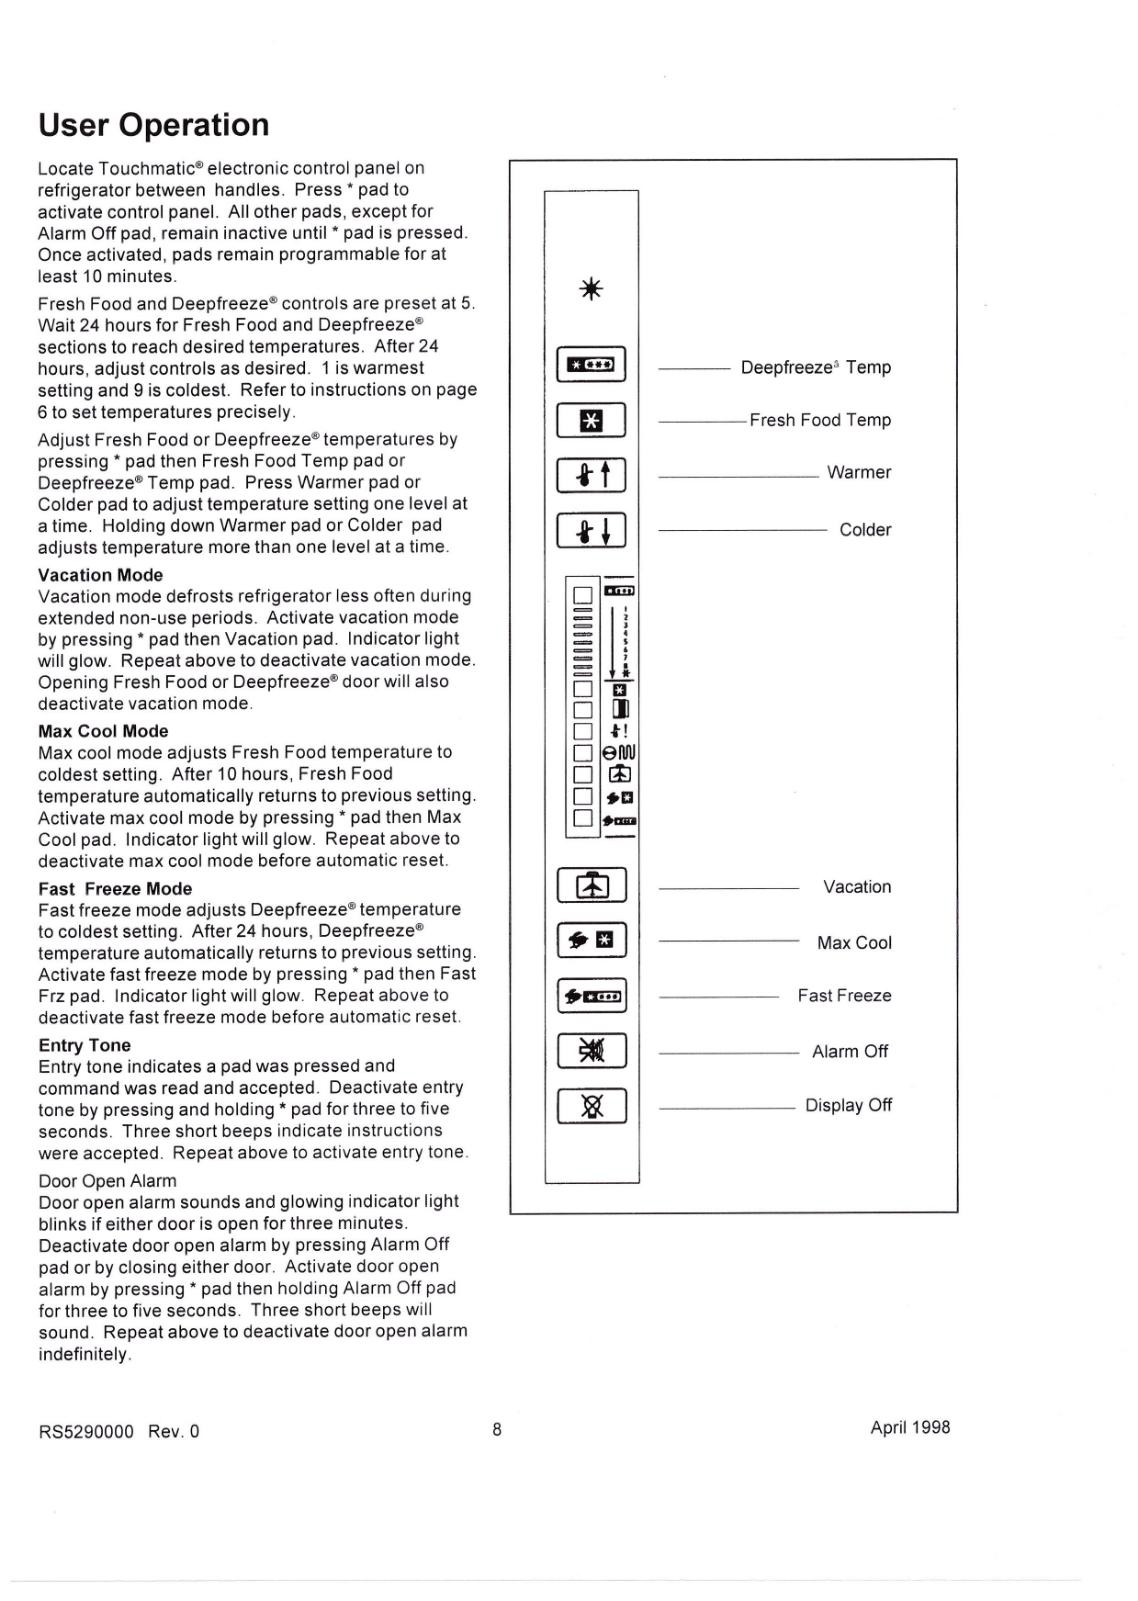 User Manual FOR SRDE/SBDE MODELS